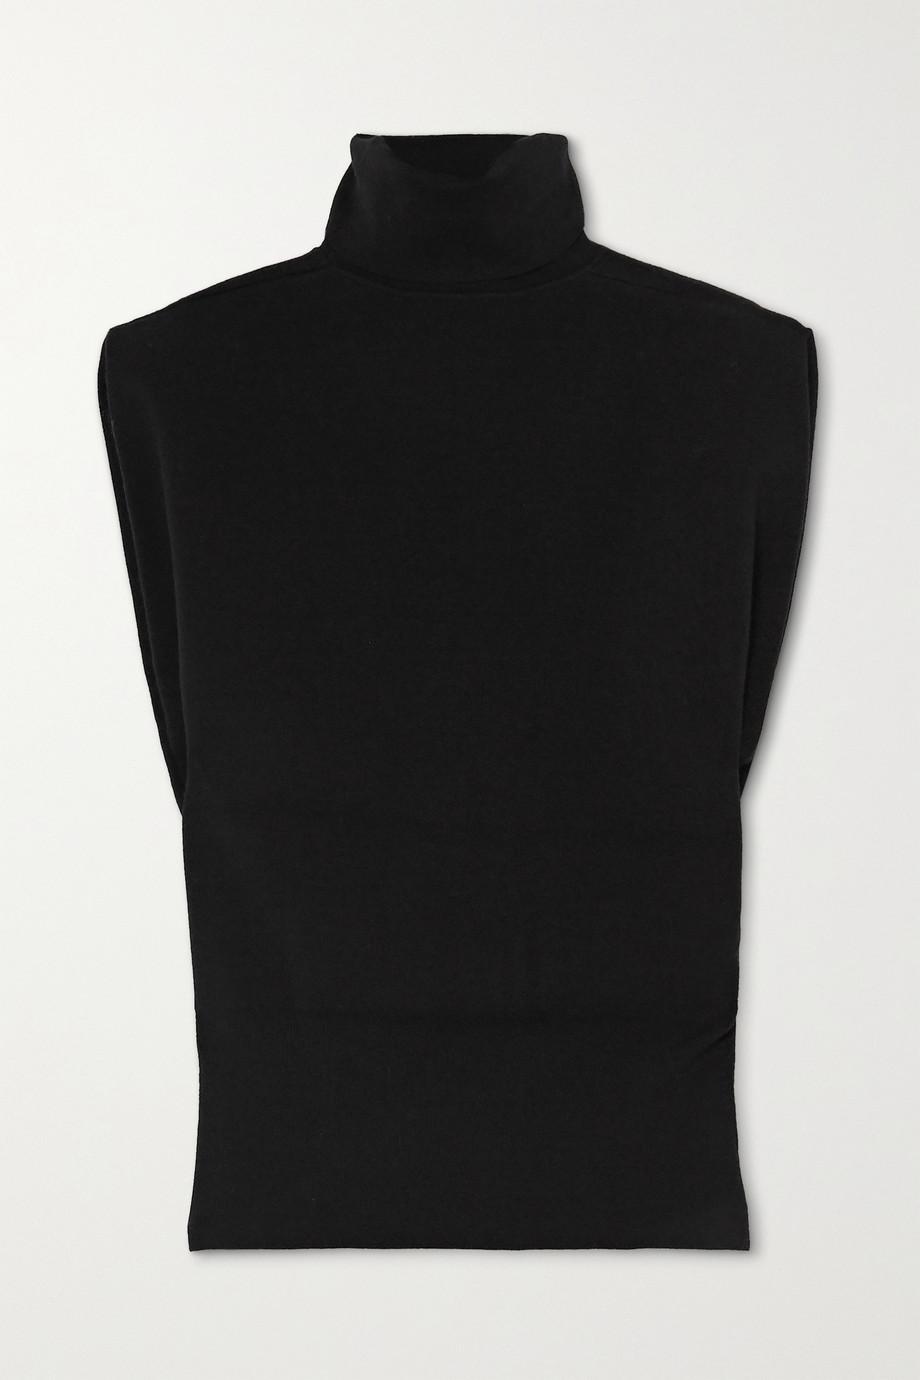 3.1 Phillip Lim Wool-blend turtleneck sweater